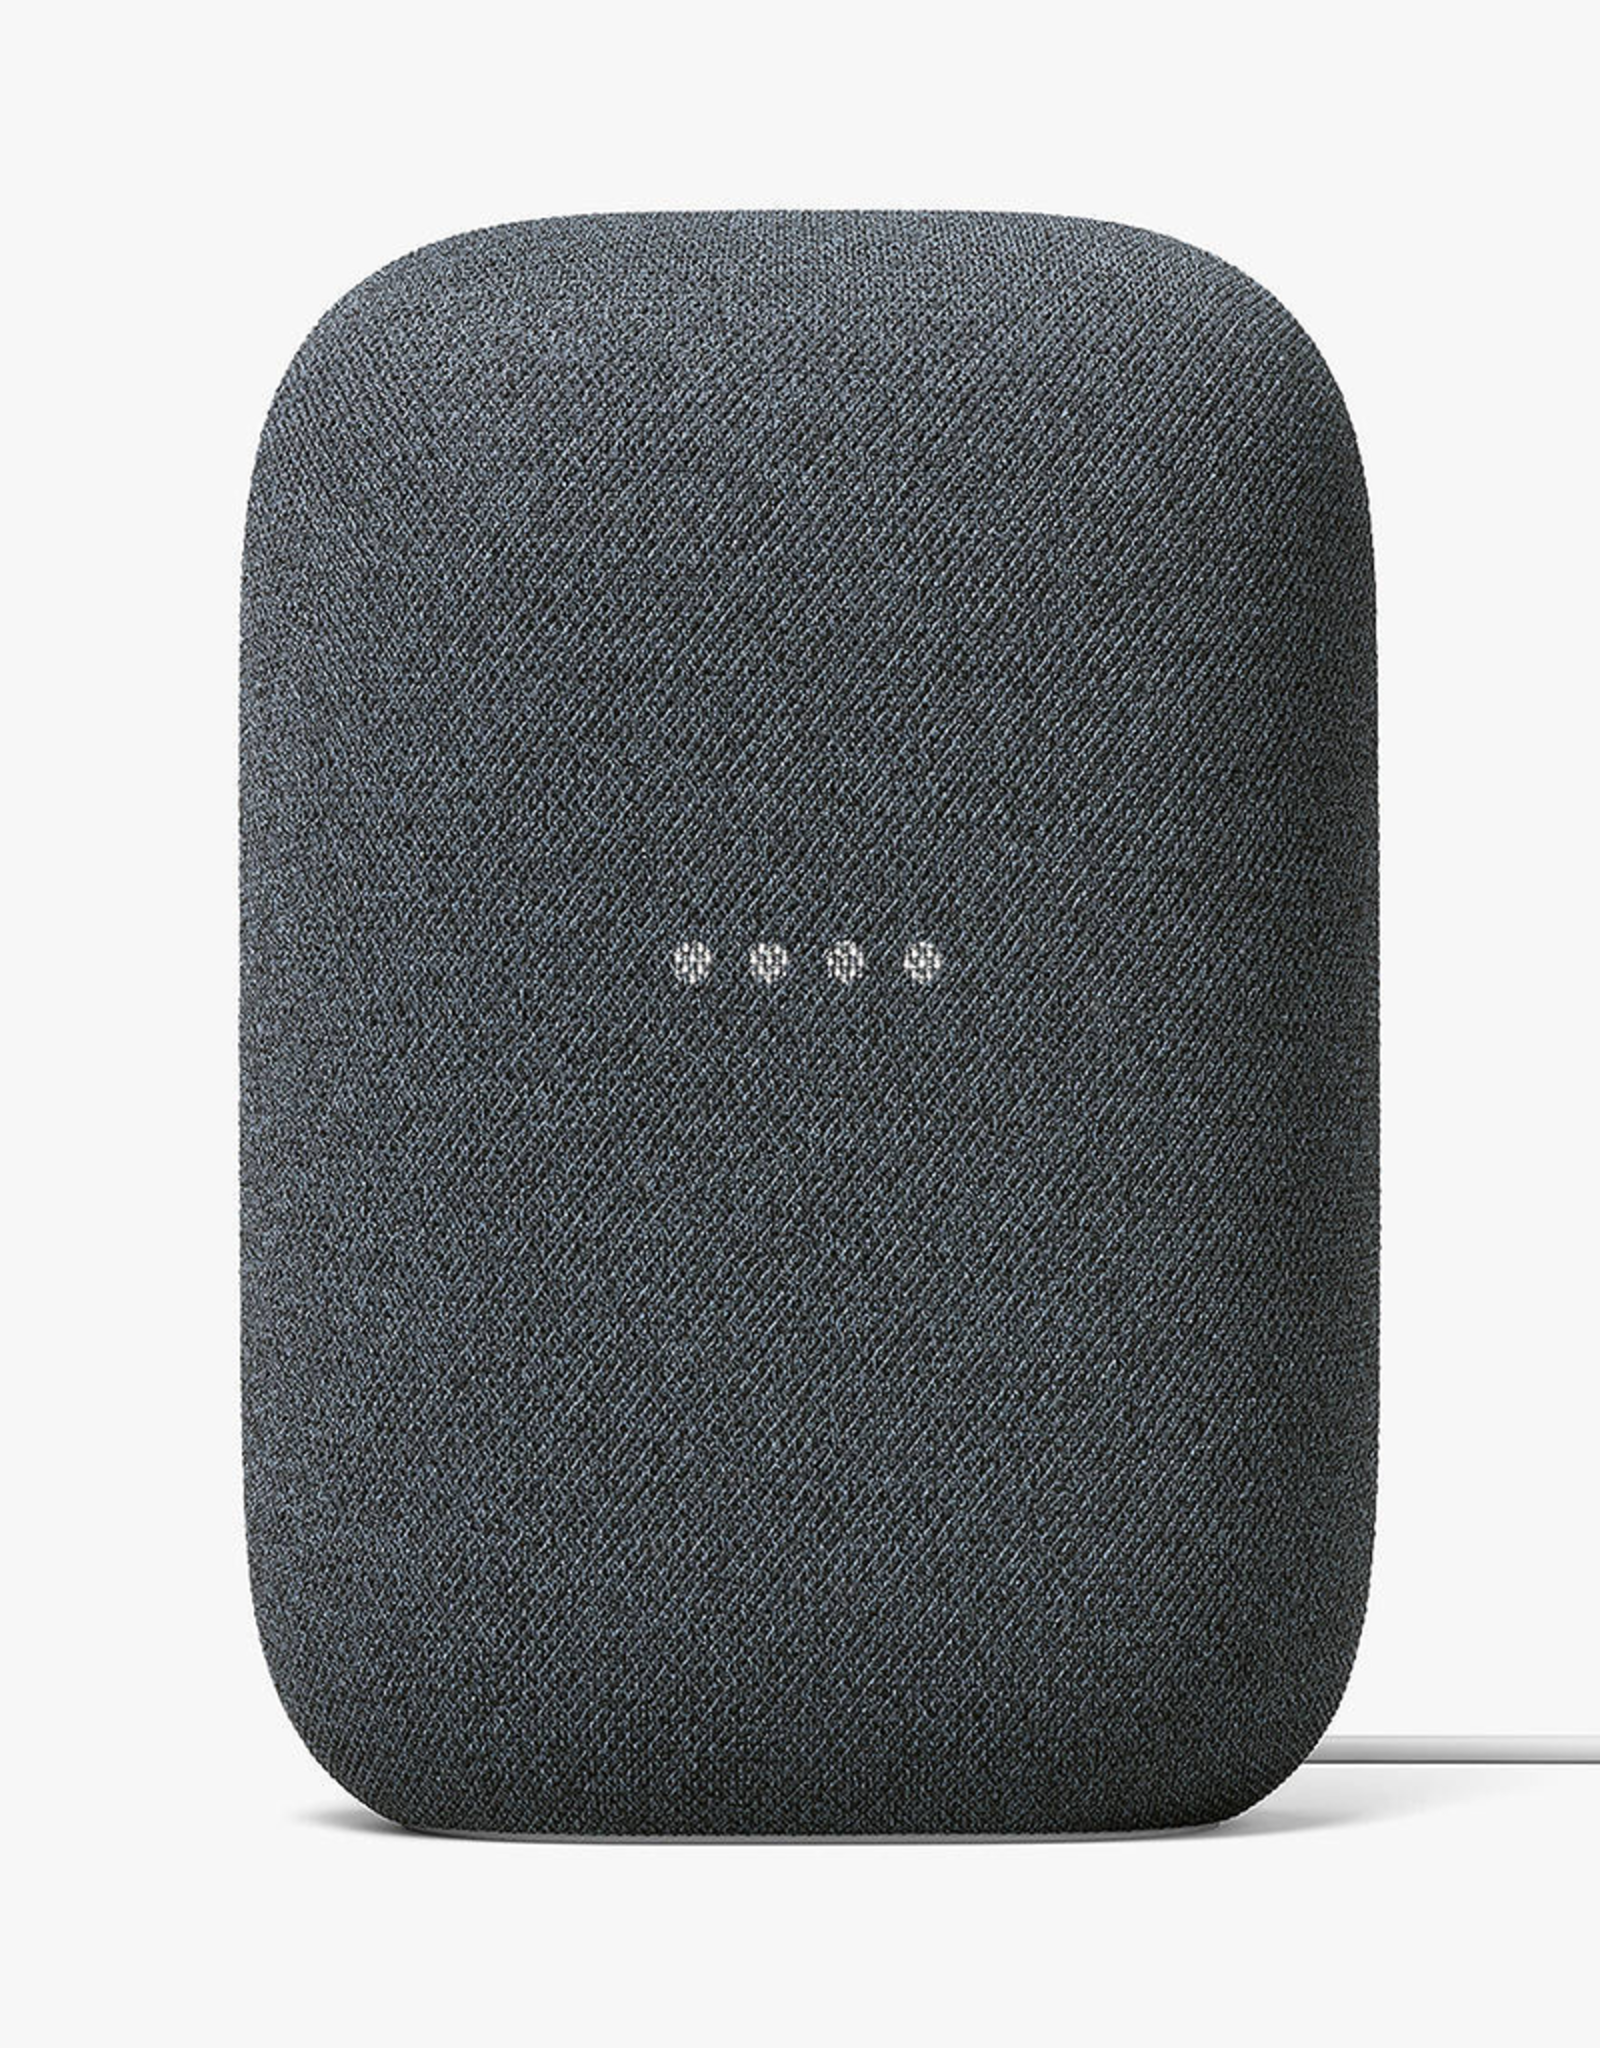 Google Google - Nest Audio - Smart Speaker - Charcoal